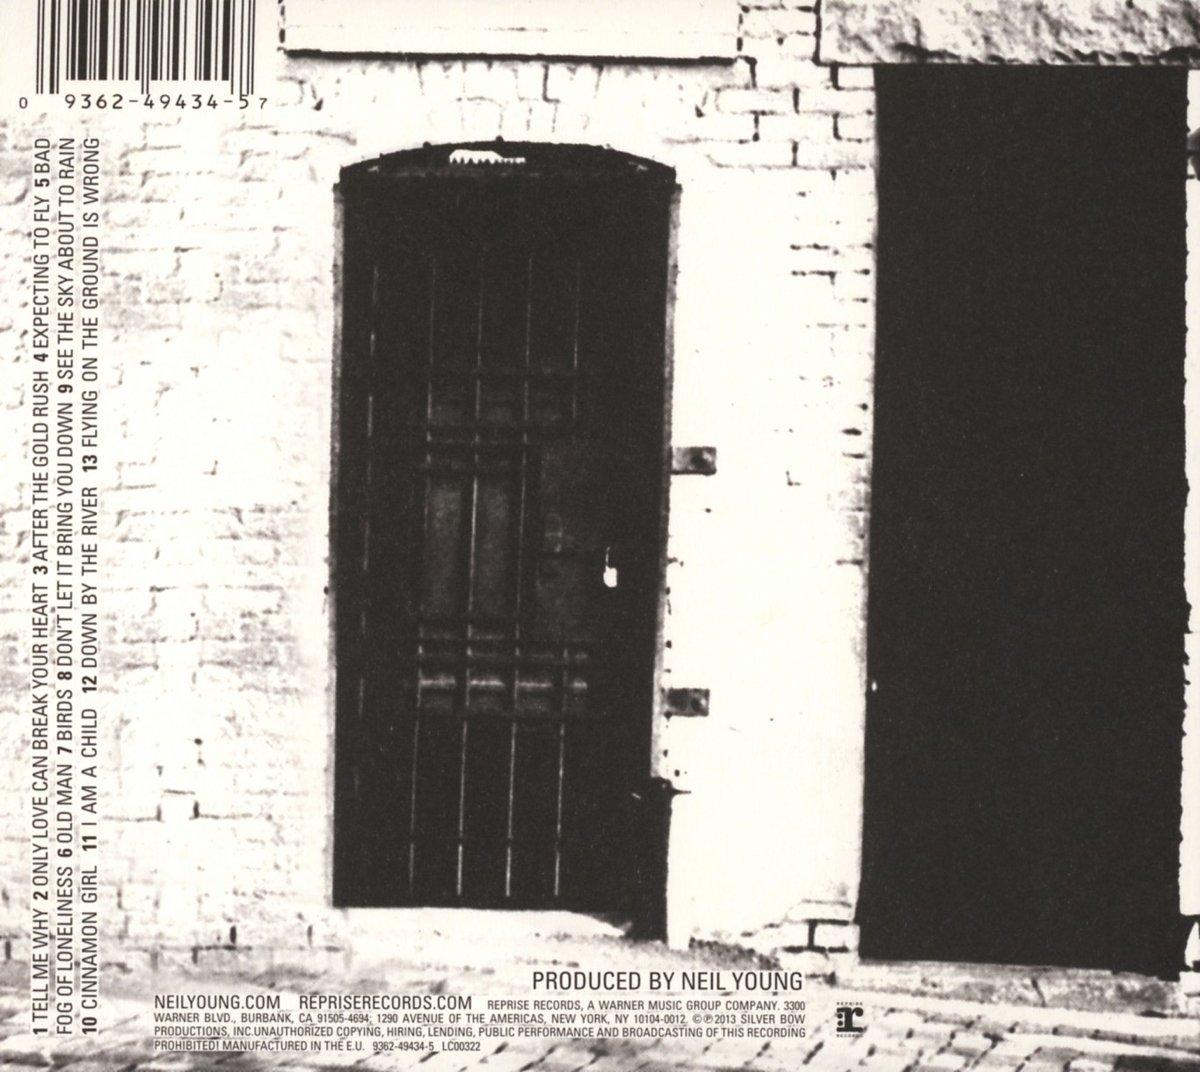 sc 1 st  Amazon.com & Neil Young - Live At The Cellar Door - Amazon.com Music